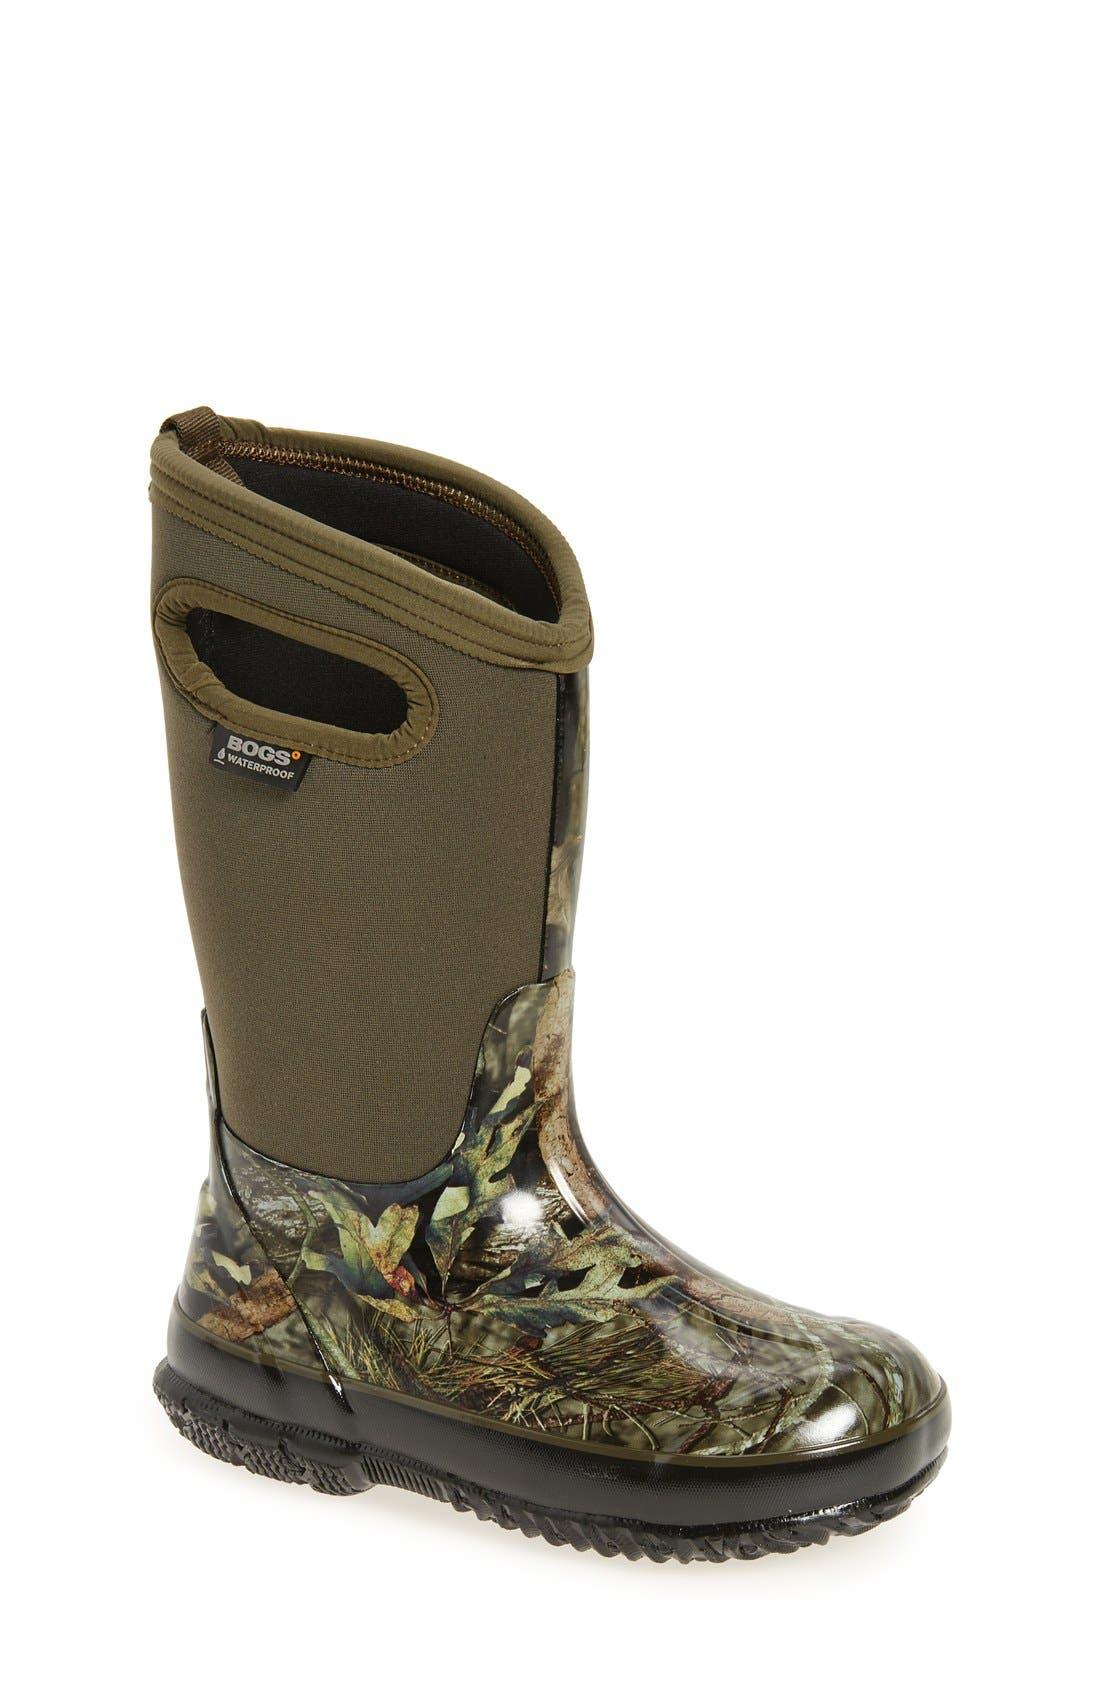 Bogs Classic Camo Insulated Waterproof Boot (Walker, Toddler, Little Kid & Big Kid)